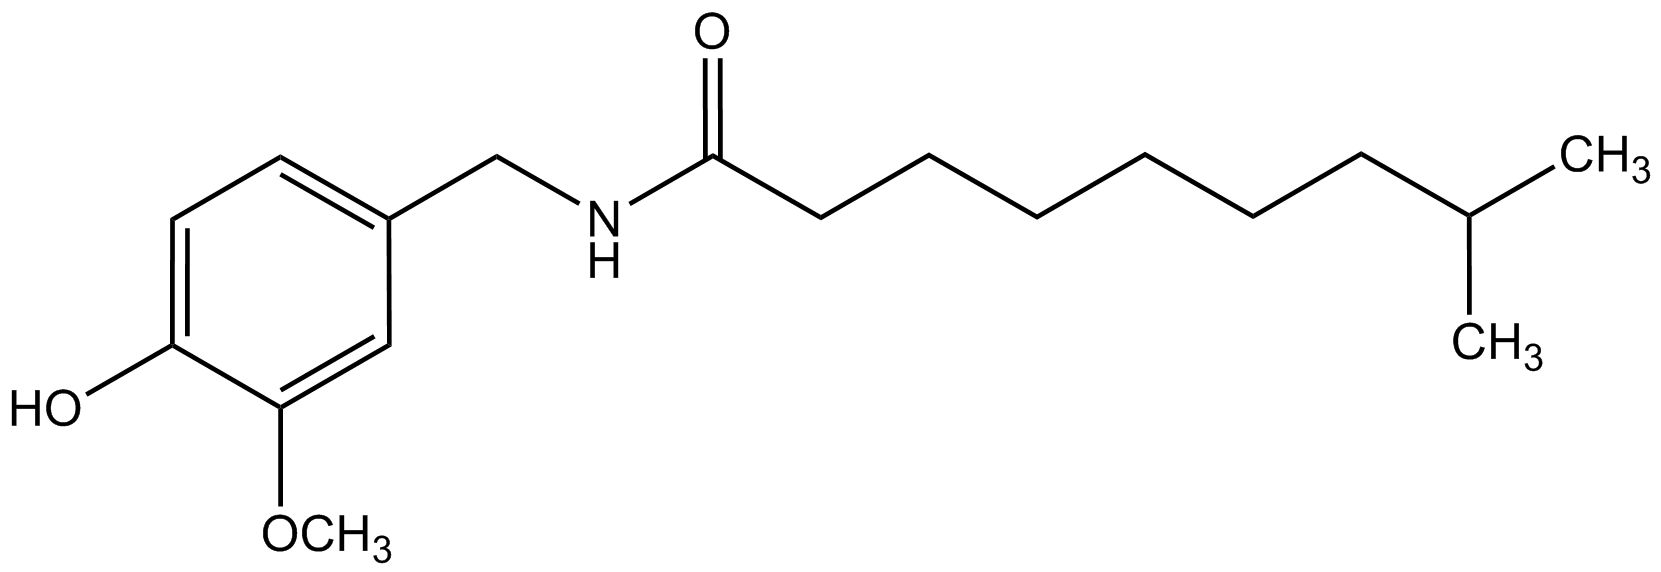 Dihydrocapsaicin phyproof® Referenzsubstanz | PhytoLab